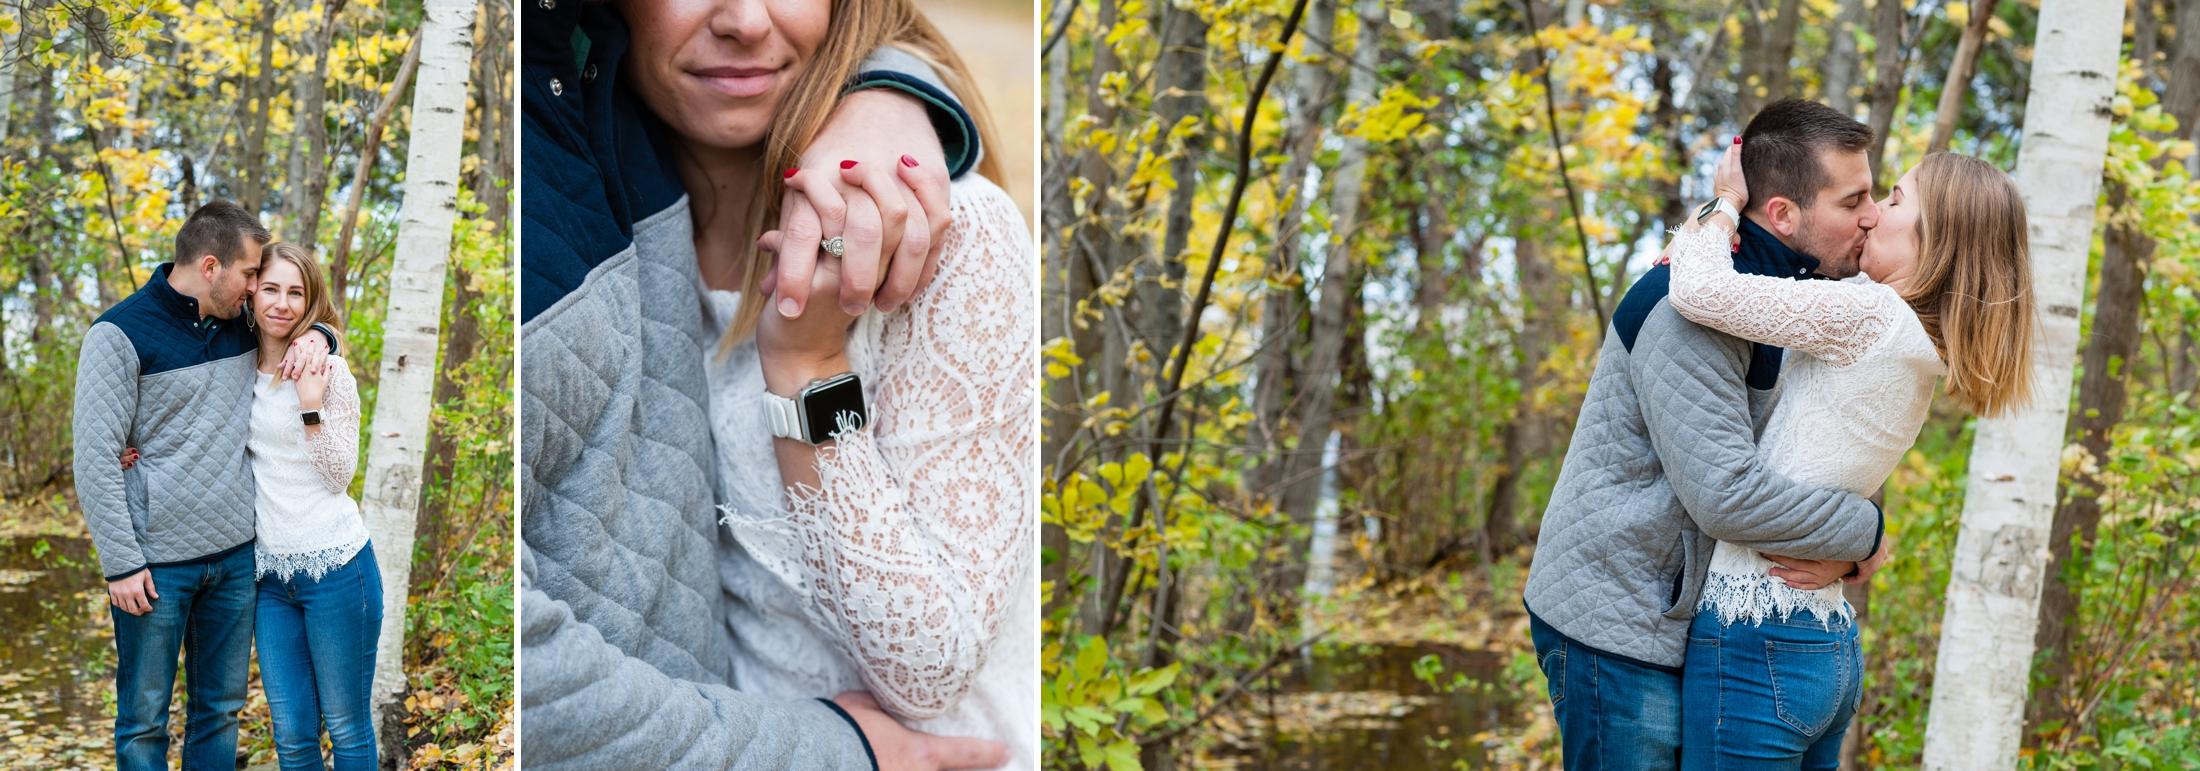 Wisconsin Wedding Photographer, Green Bay Engagement | KLEM Studios